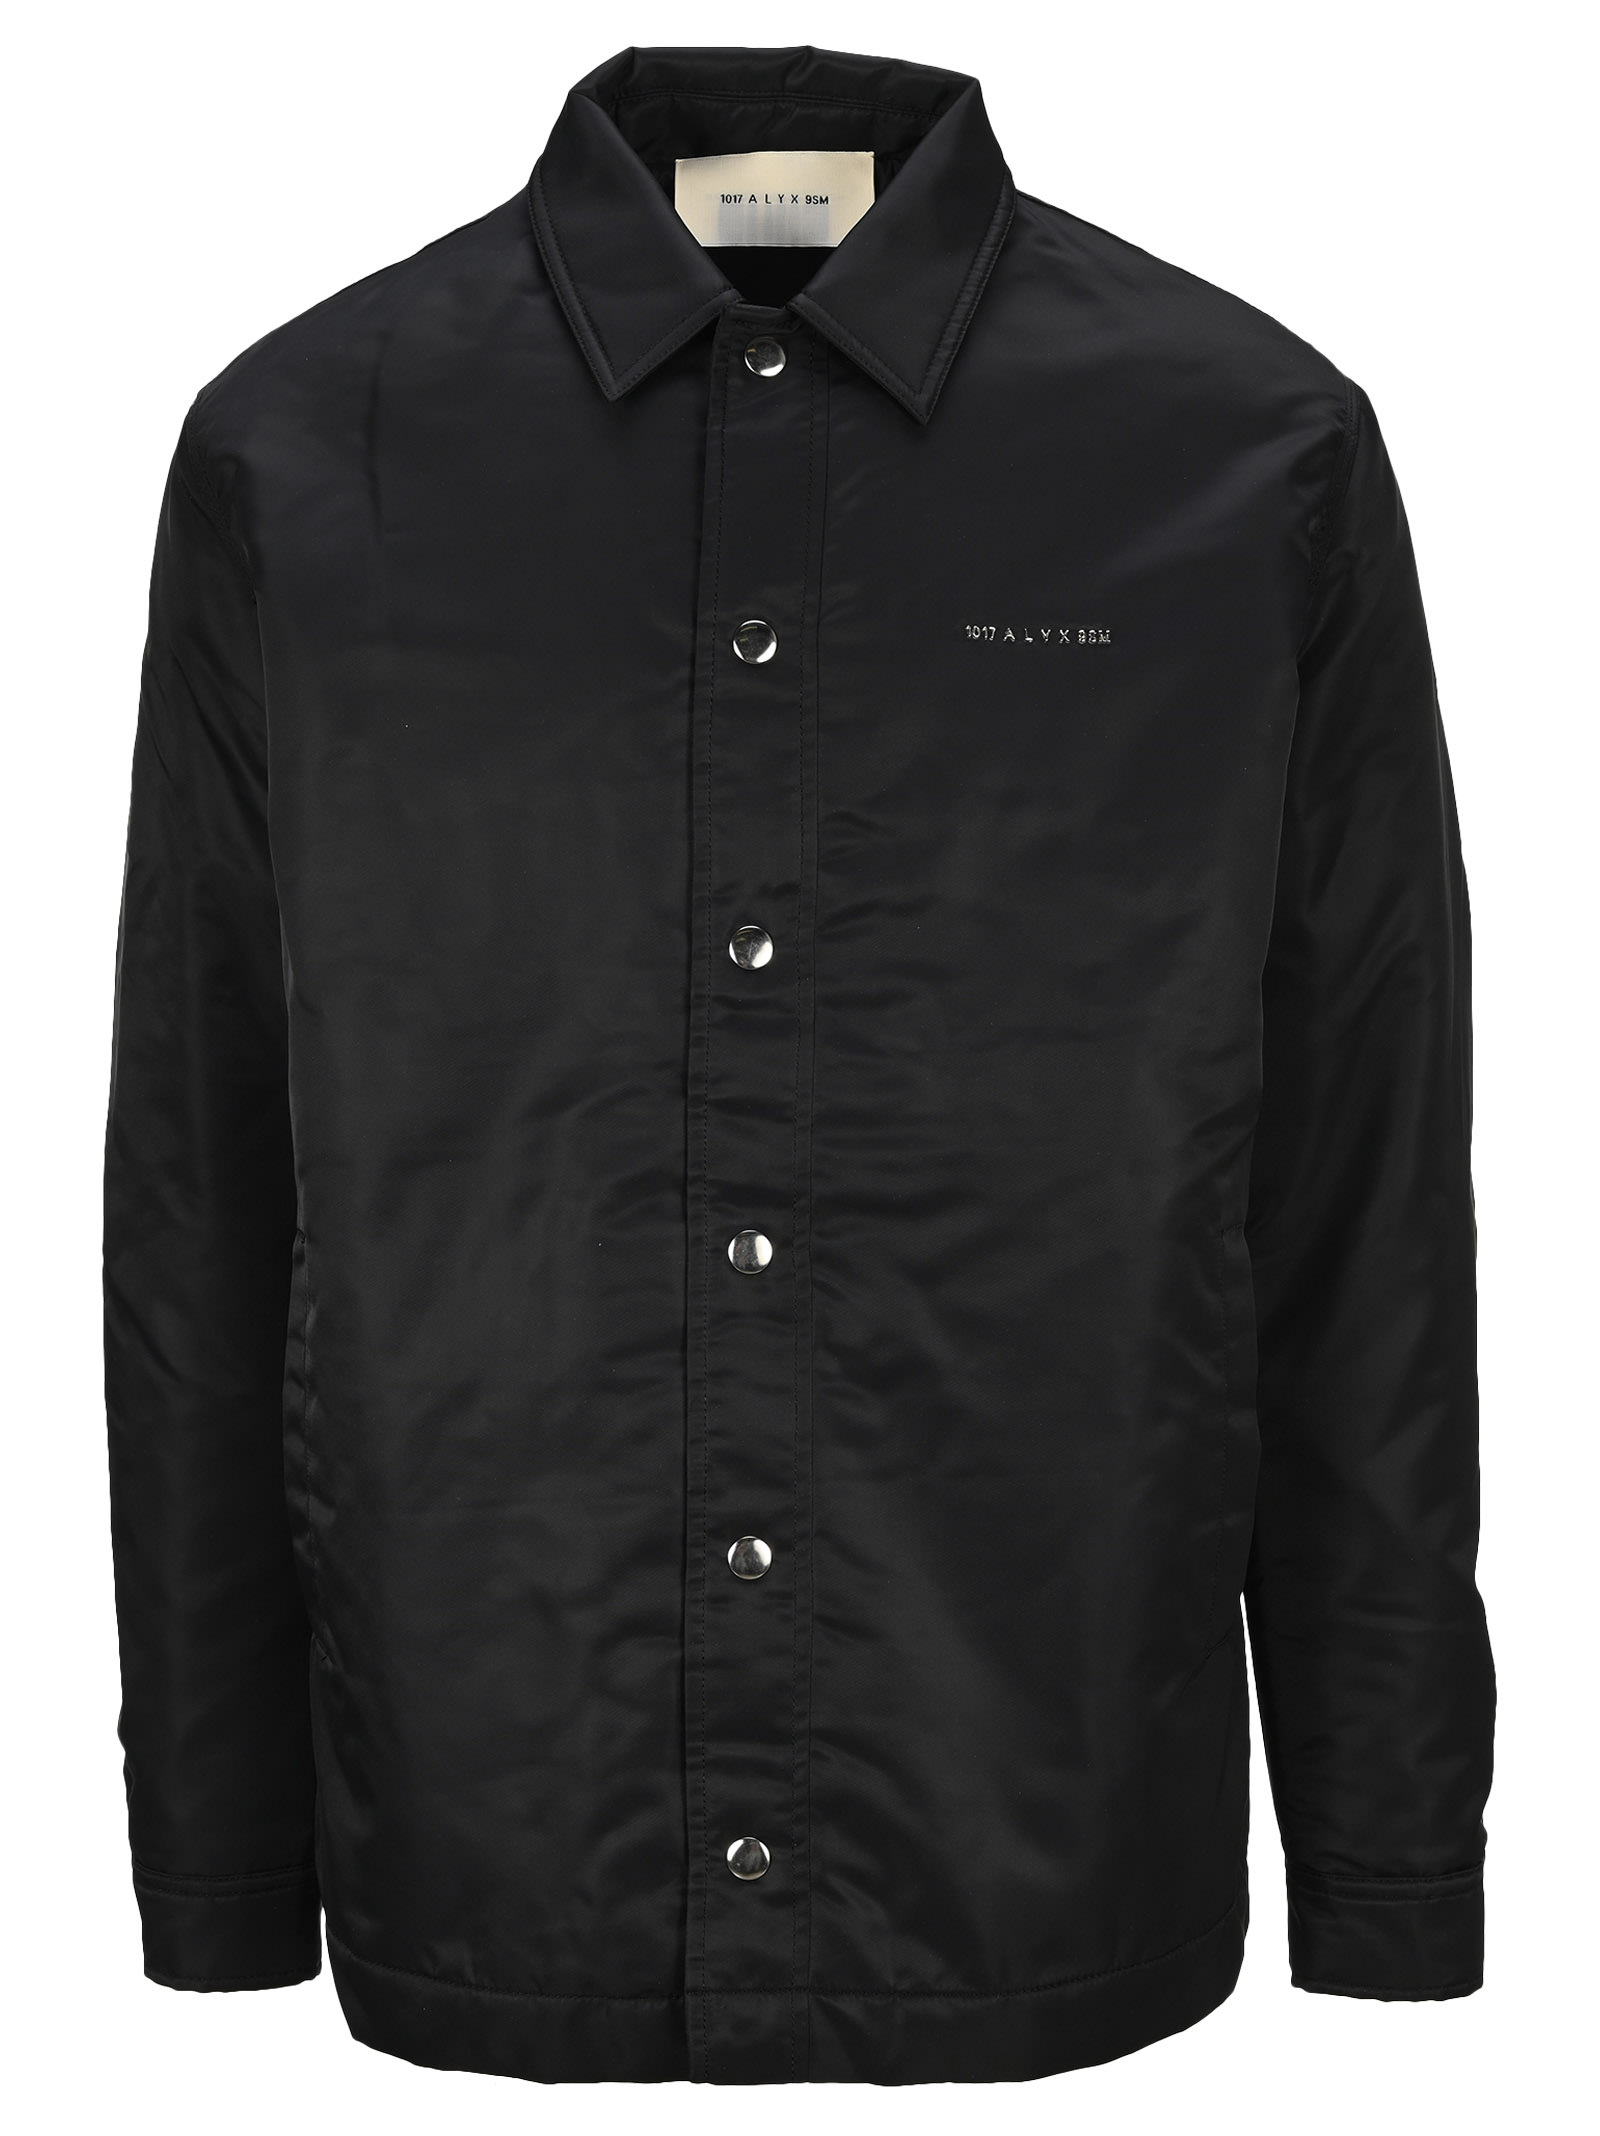 Alyx Raised Logo Shell Shirt Jacket In Black